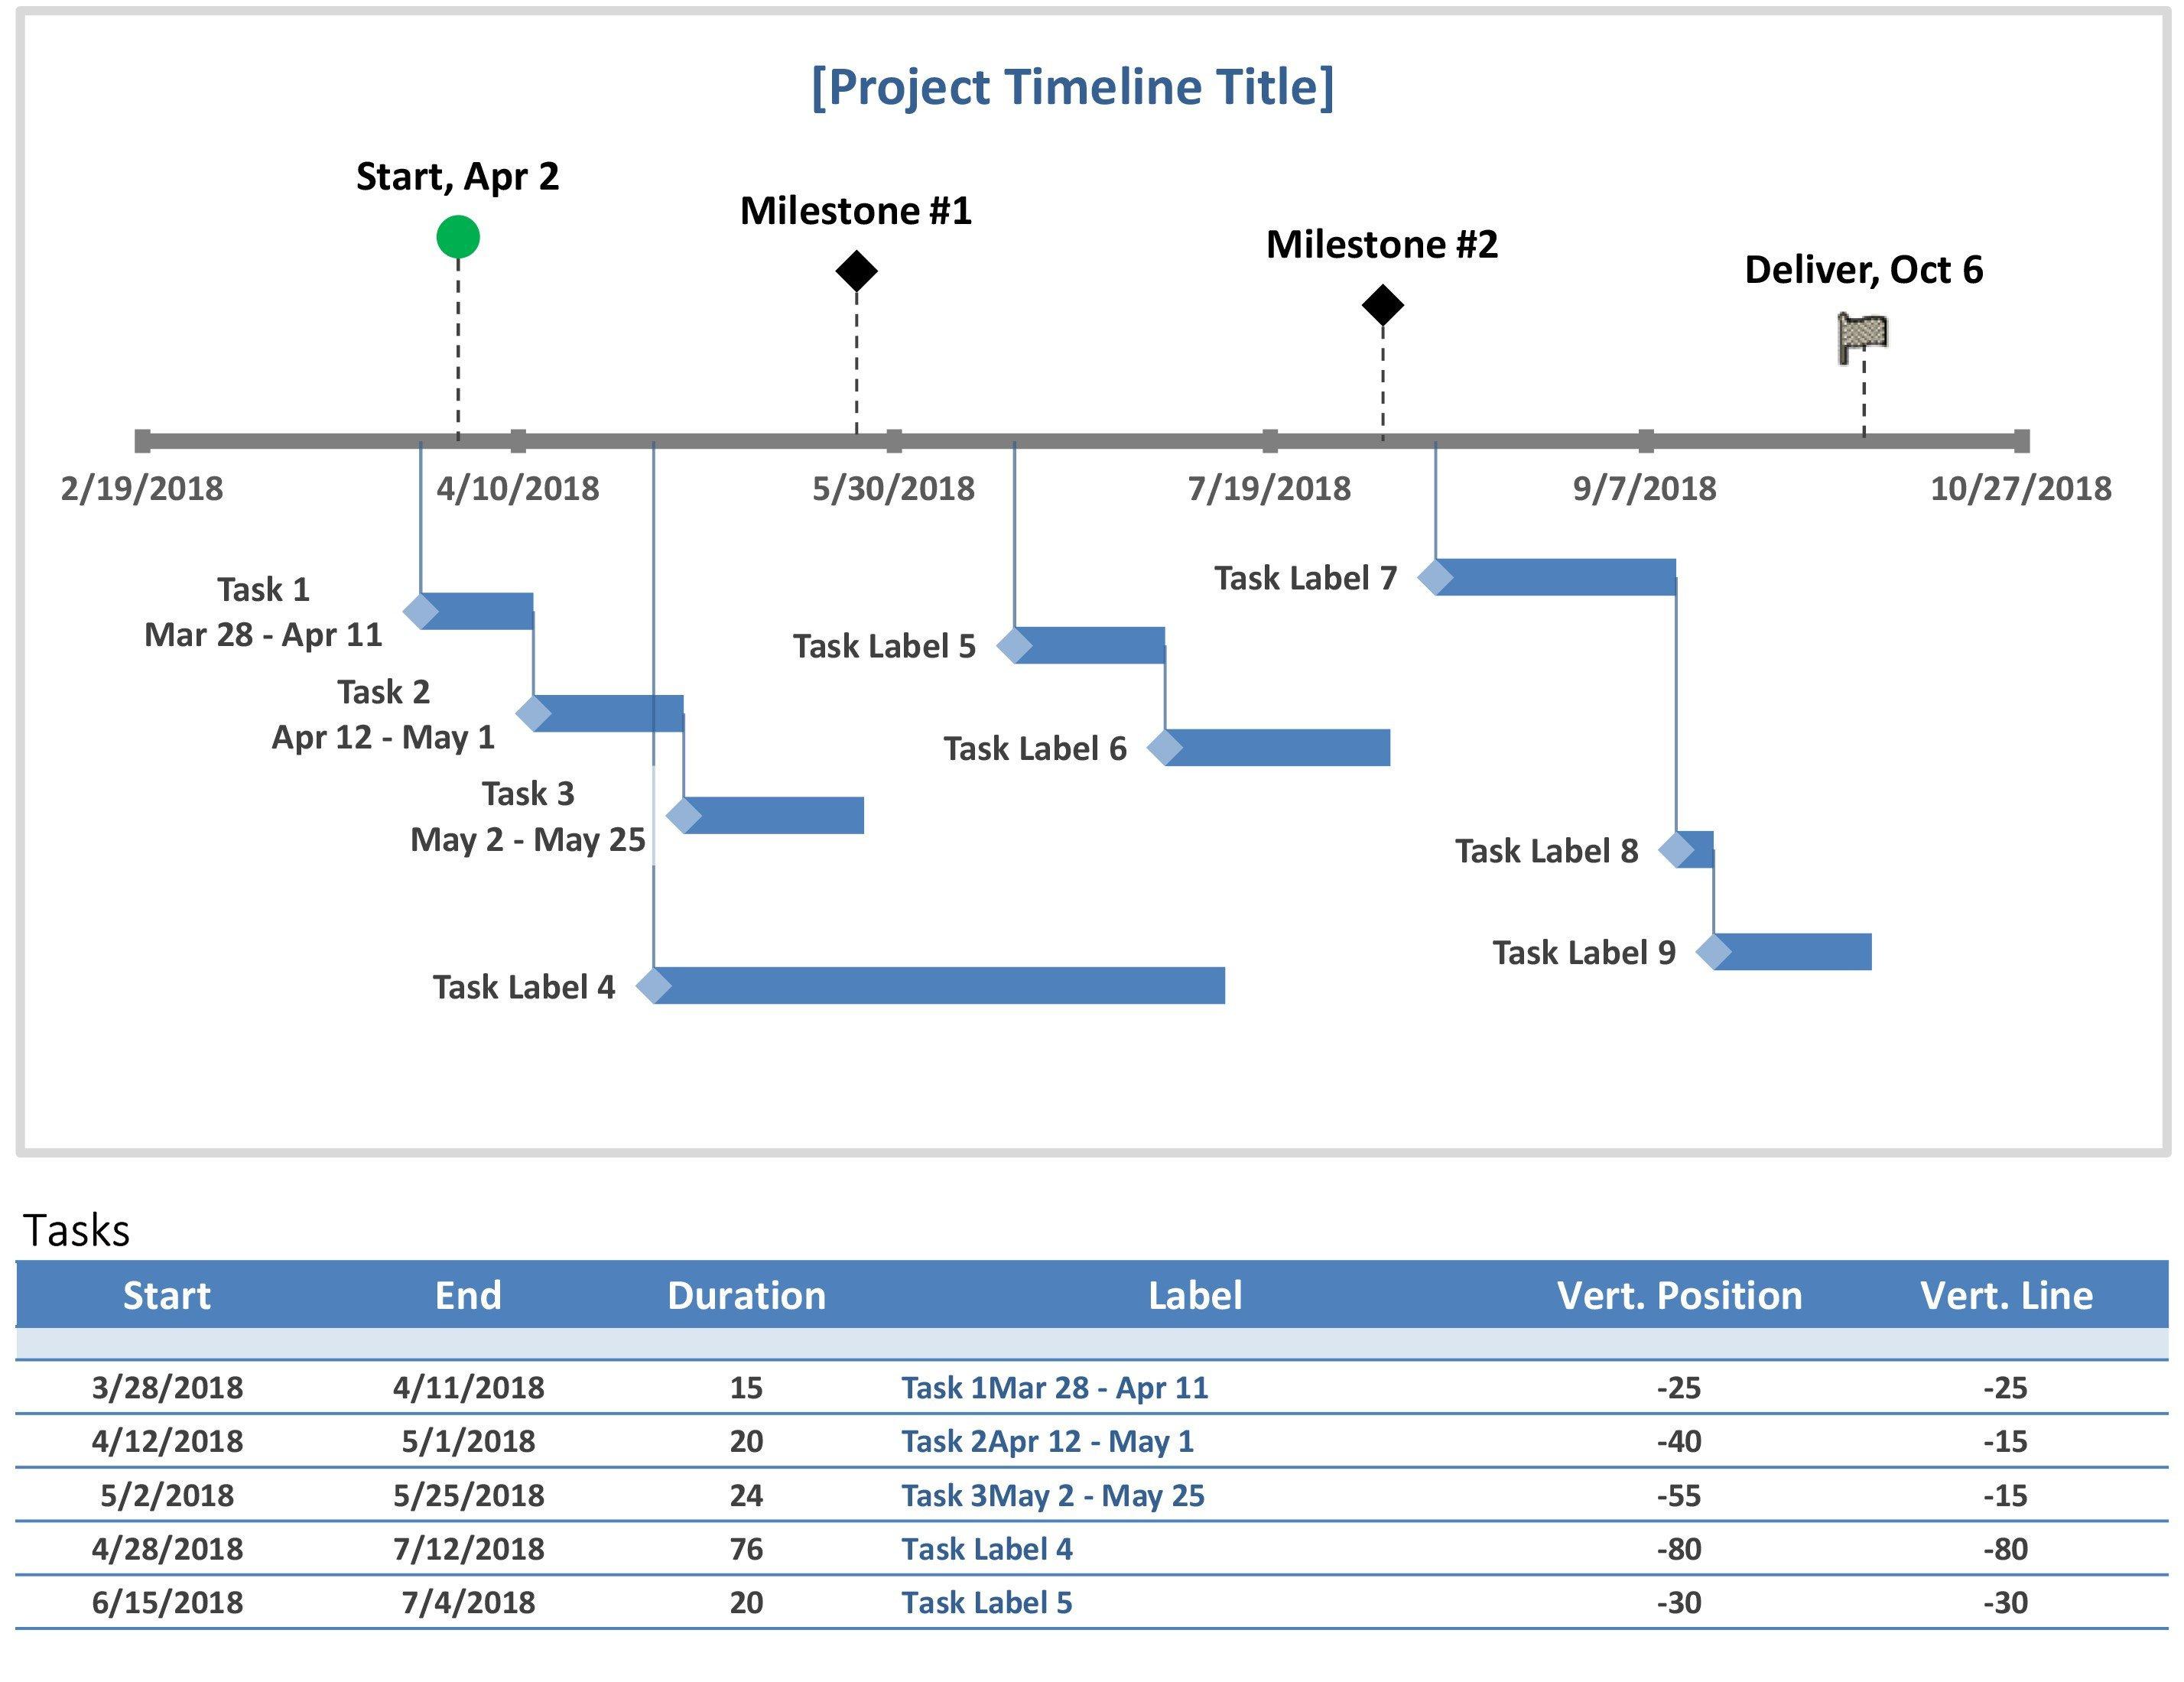 Microsoft Excel Timeline Templates Milestone and Task Project Timeline